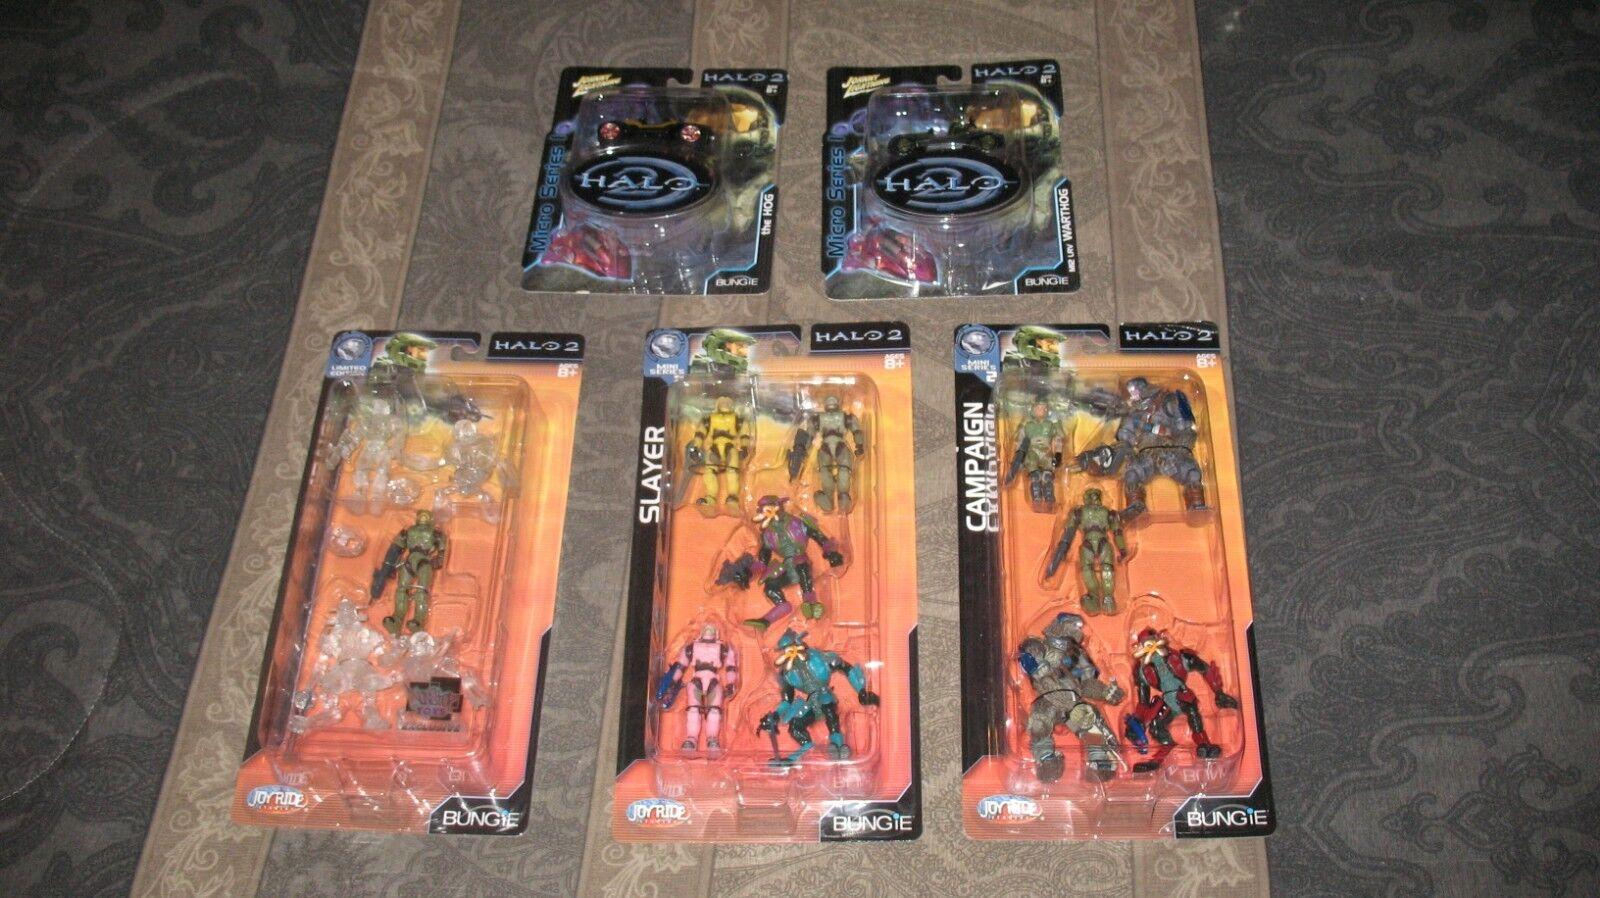 Halo 2 - mini - kollektion (slayer, kampagne 1 & 2, warthog & Gold ') - spritztour